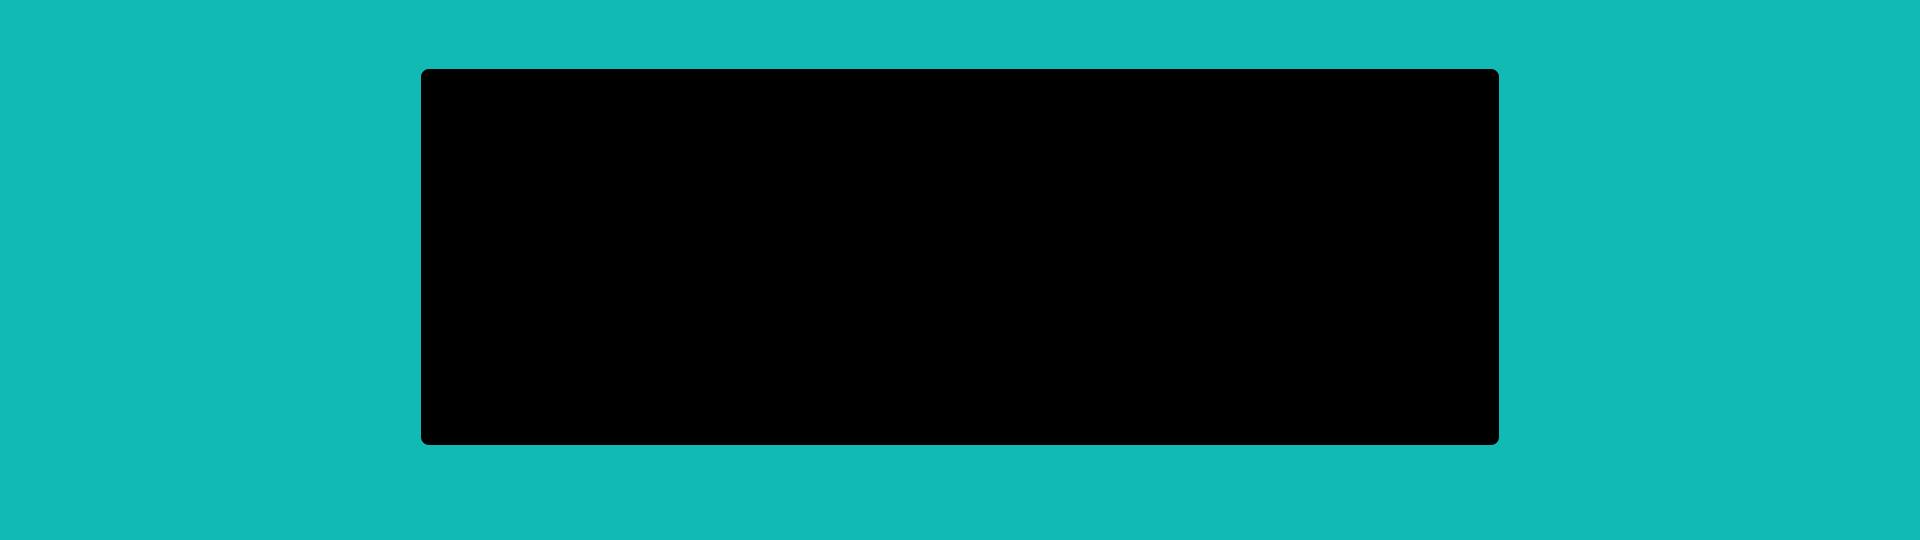 CATEGORY-MDA-KISINDIRIMIPISIRMEGRUBUURUNLERI79TLDEN-23-02